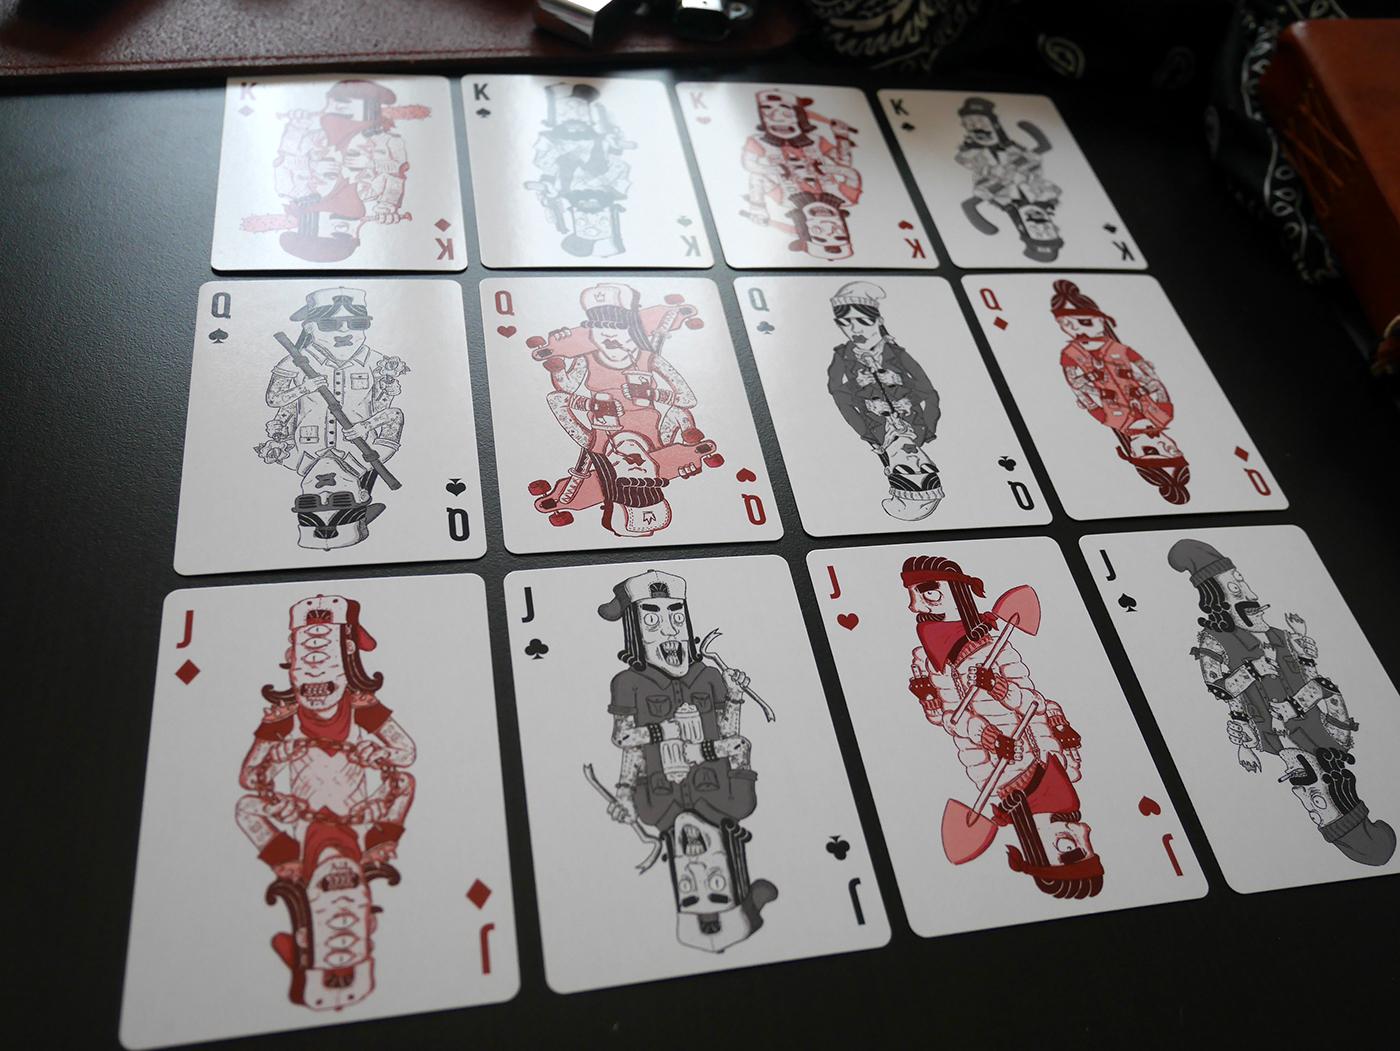 Deck Cards deck Jeu de carte Vicious vicious deck Playing Cards cards Samnuts cartes à jouer Magic